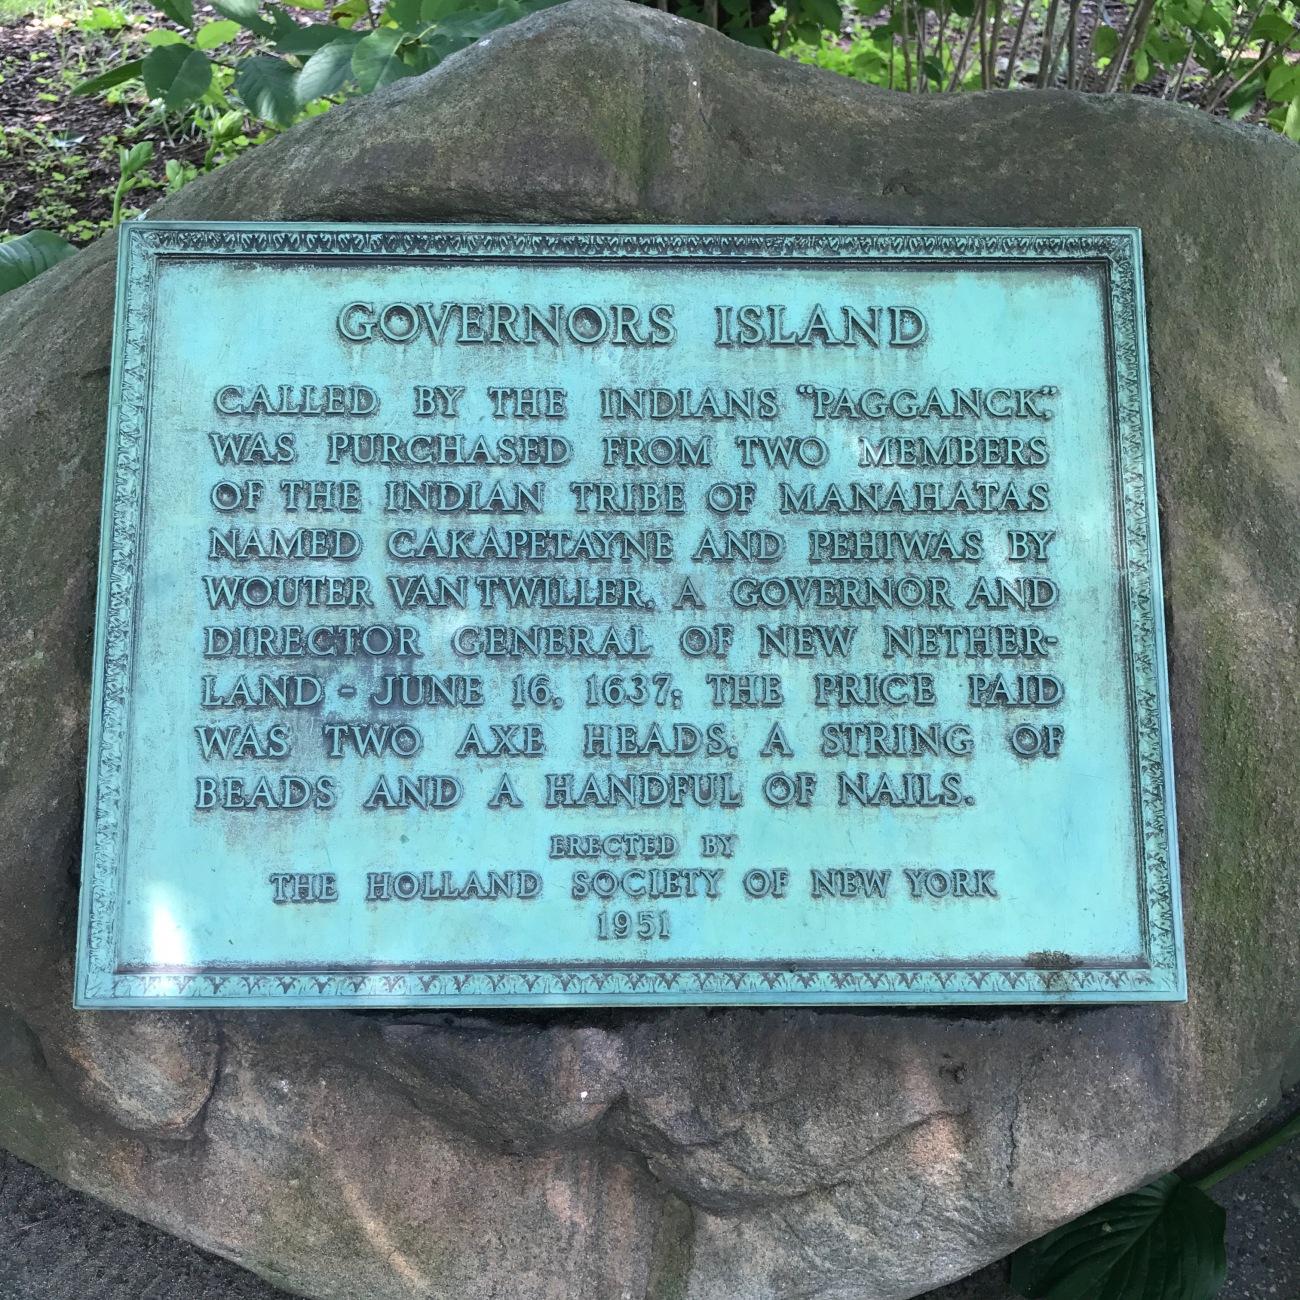 Governors Island Plaque (WildmooBooks.com)